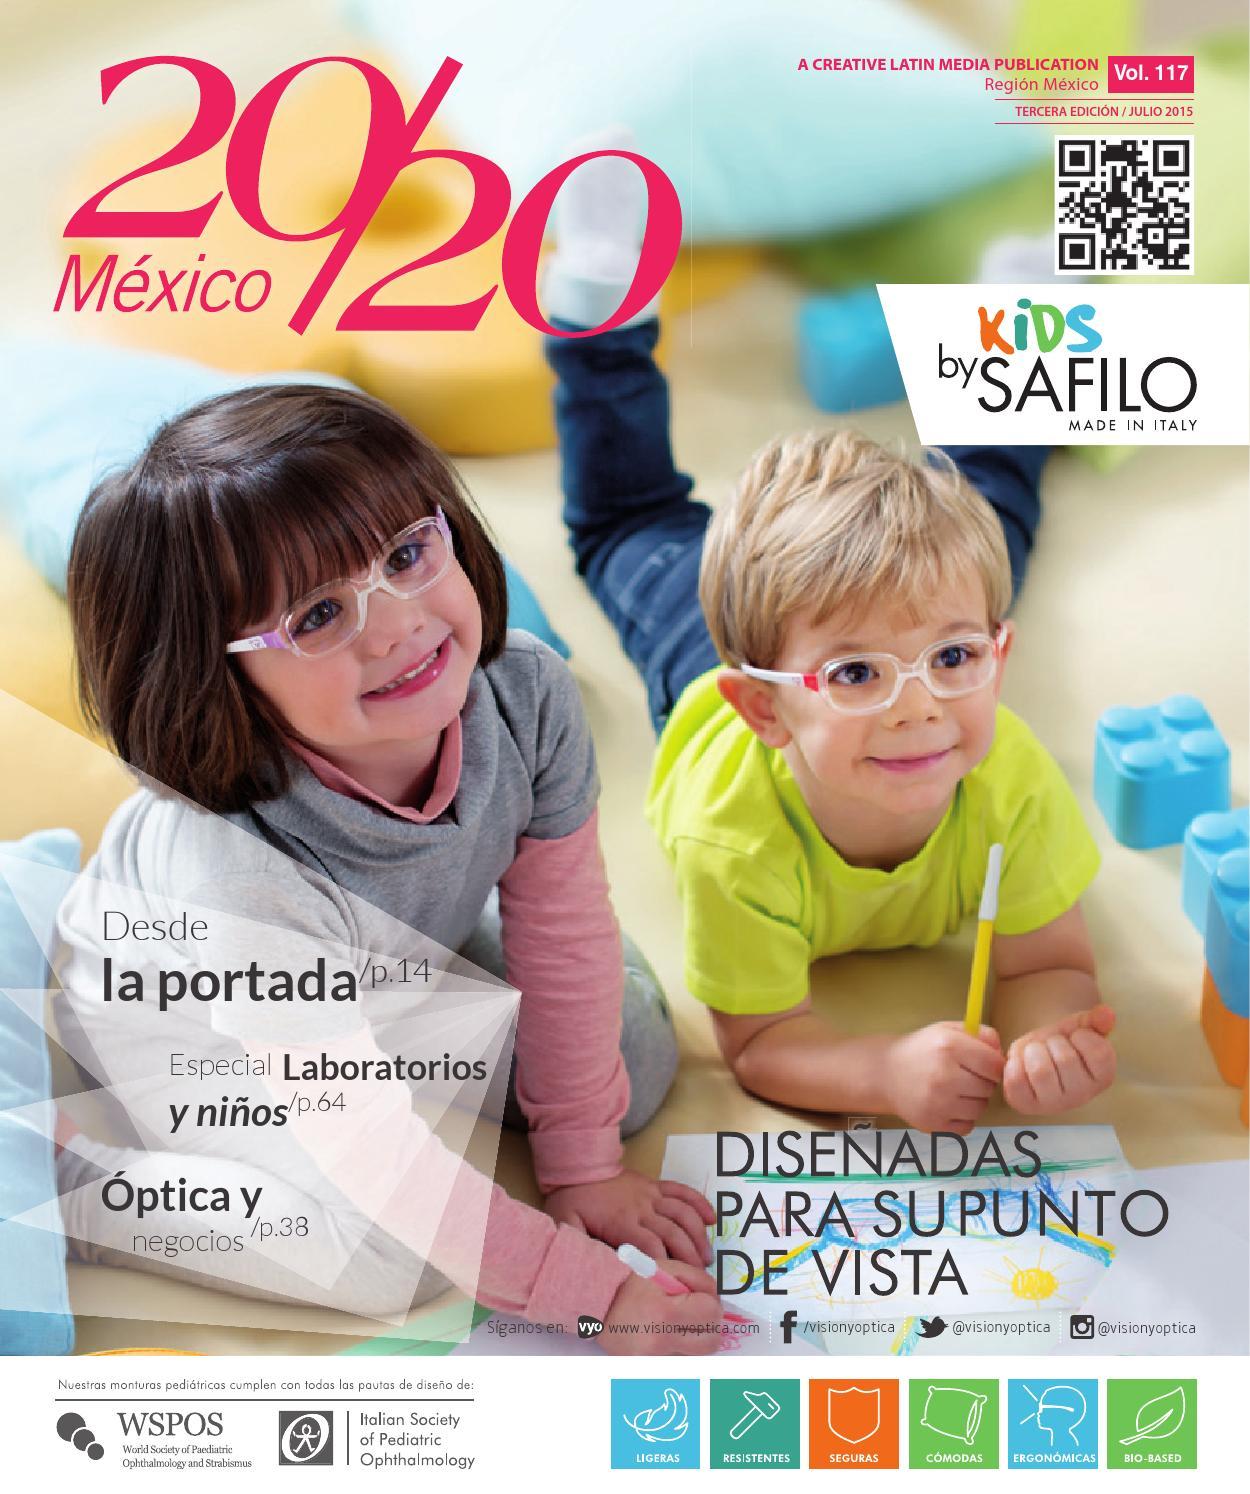 2020 3ra 2015 mx by Creative Latin Media LLC - issuu